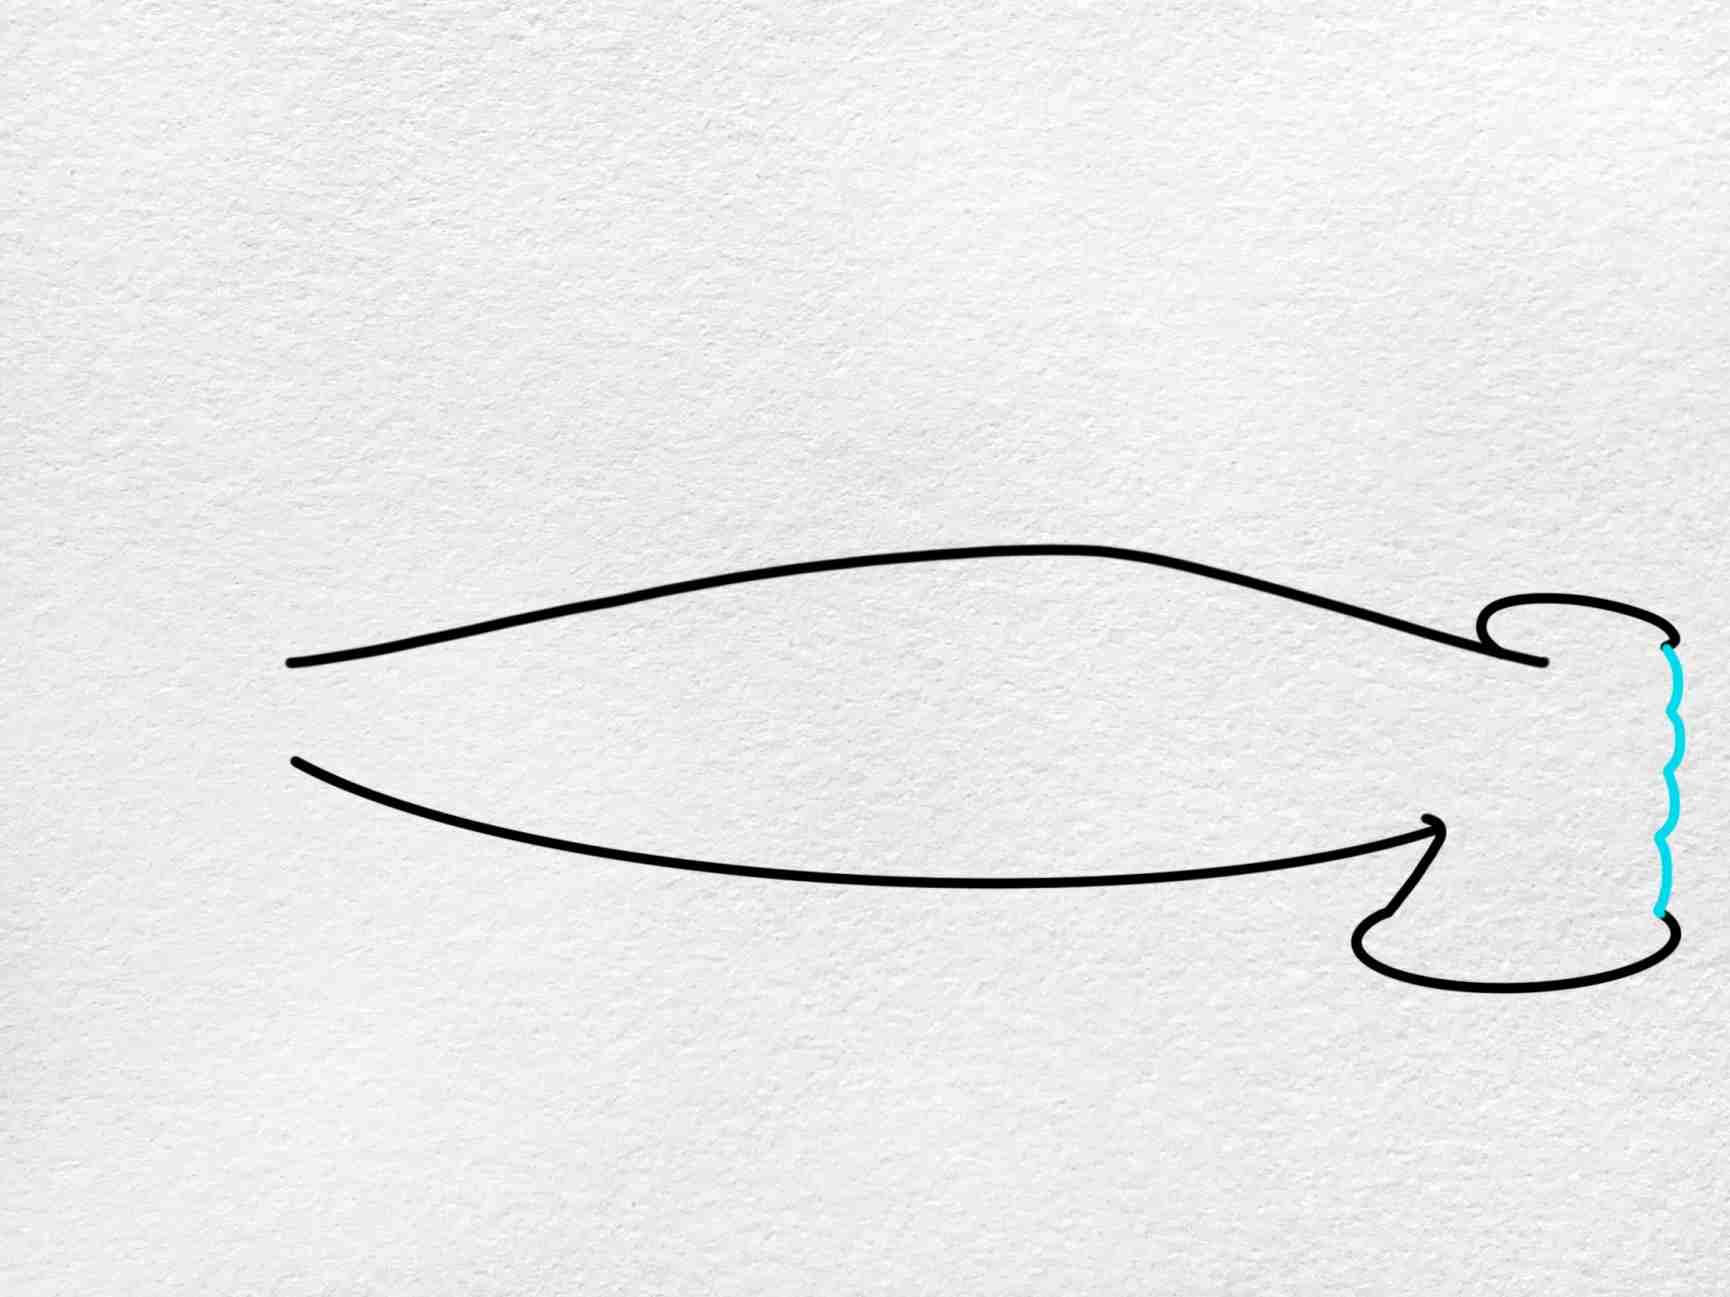 How To Draw A Hammerhead Shark: Step 3